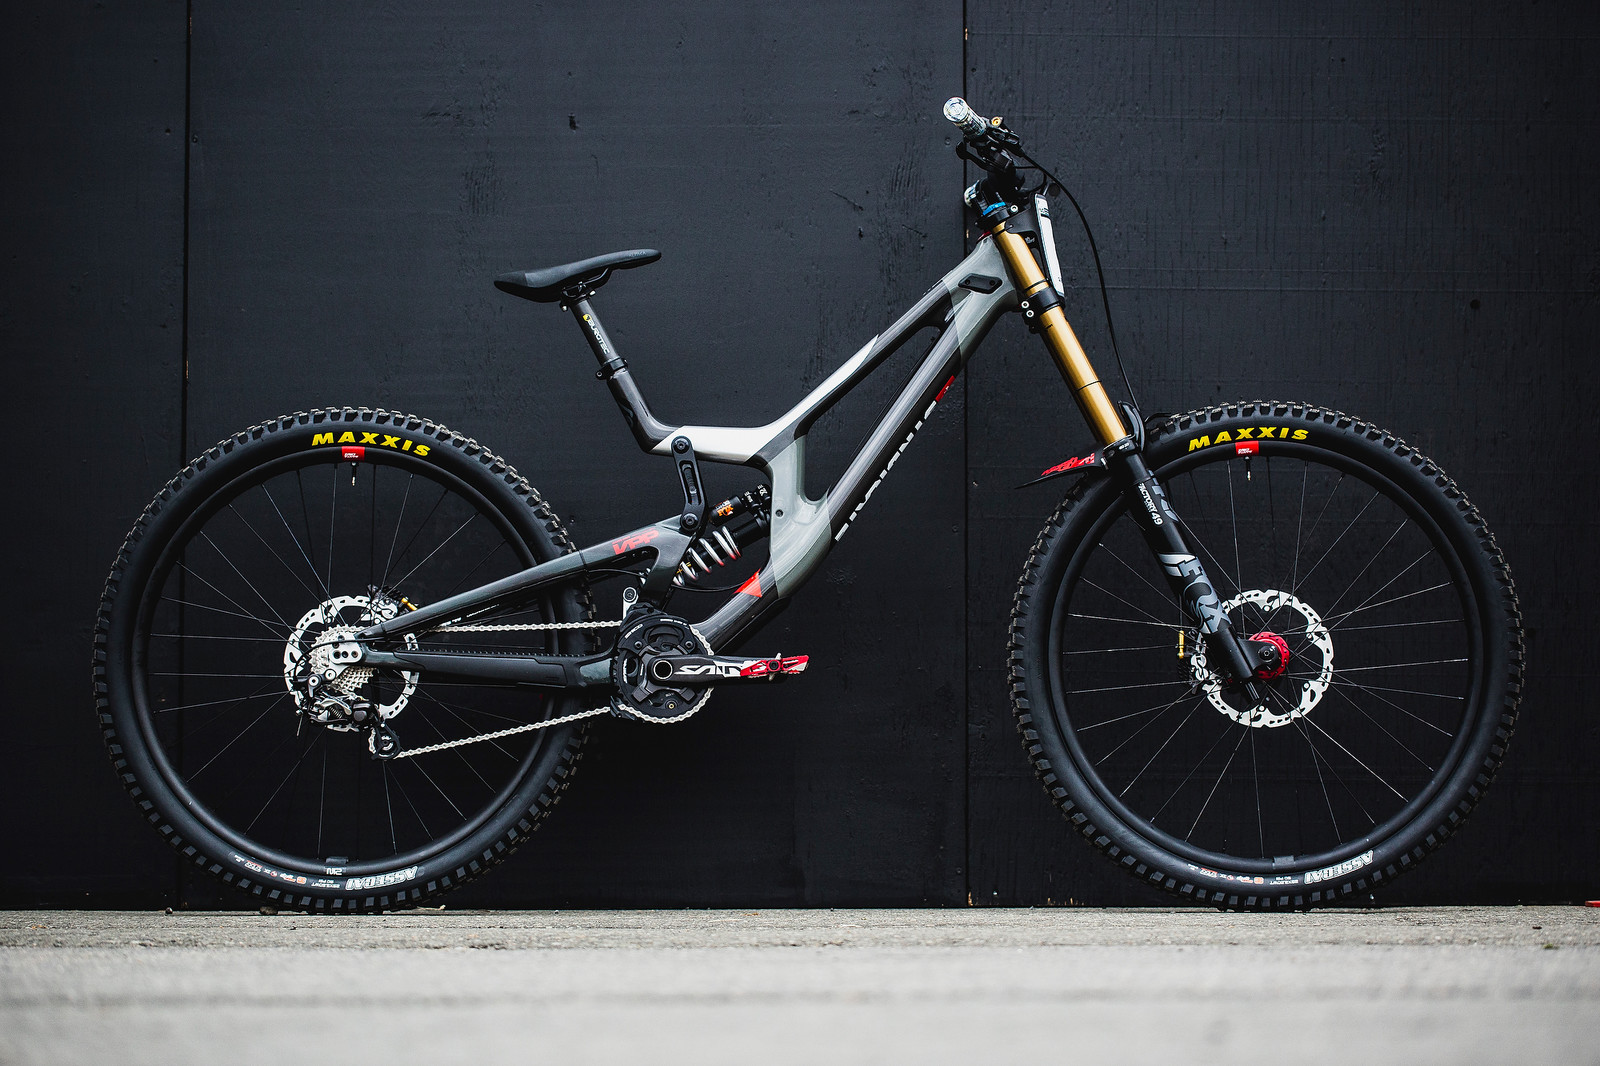 Greg Minnaar's Santa Cruz V10 for 2019 World Championships - Santa Cruz Syndicate 2019 World Championships Race Bikes - Mountain Biking Pictures - Vital MTB